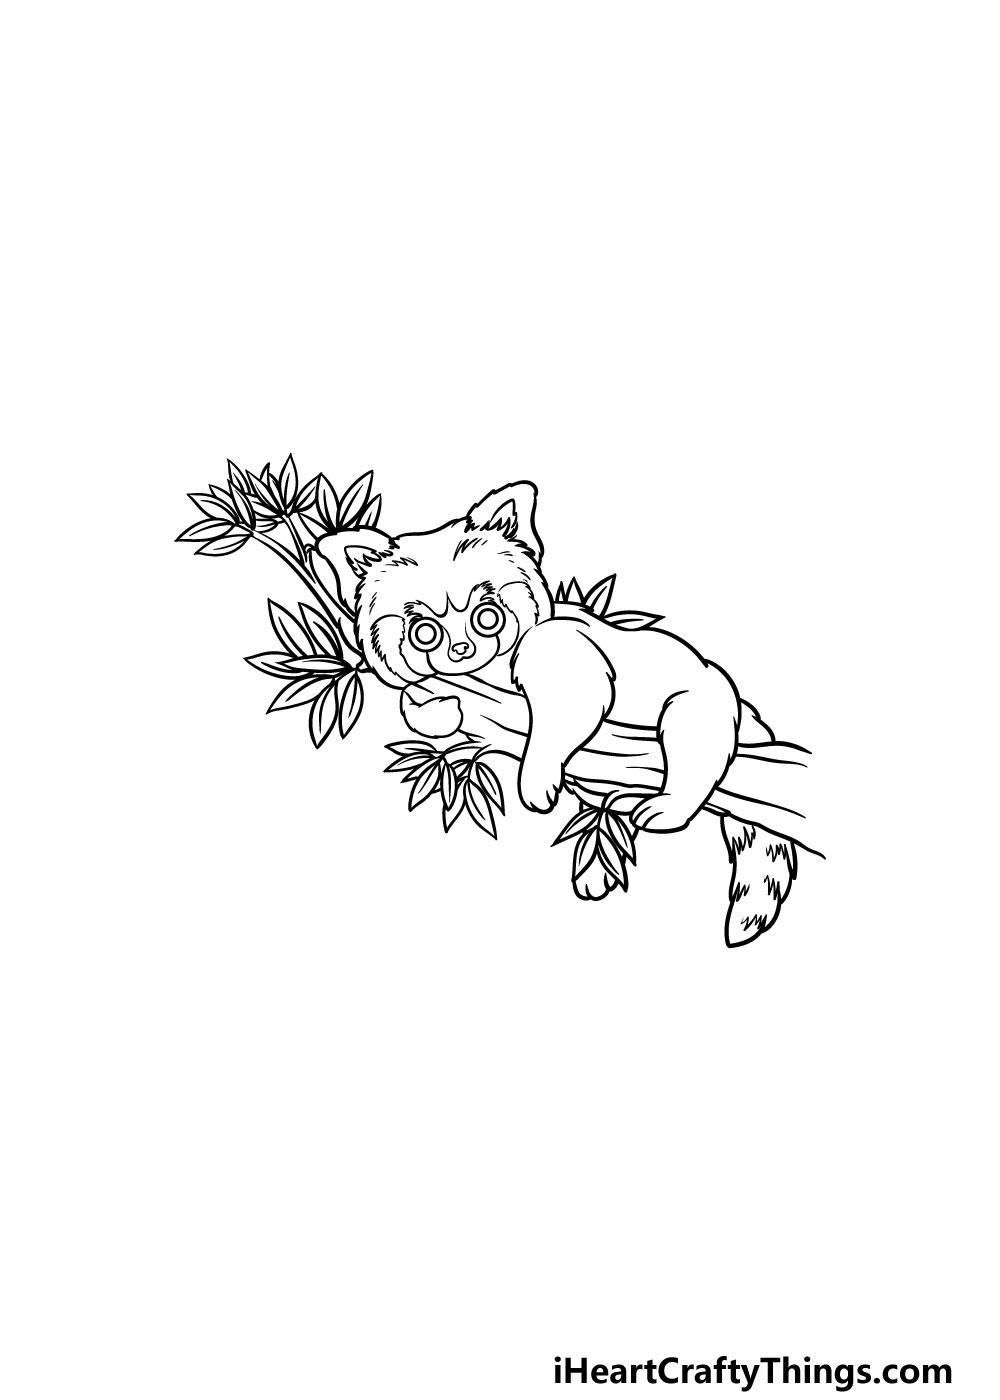 drawing a Red Panda step 5